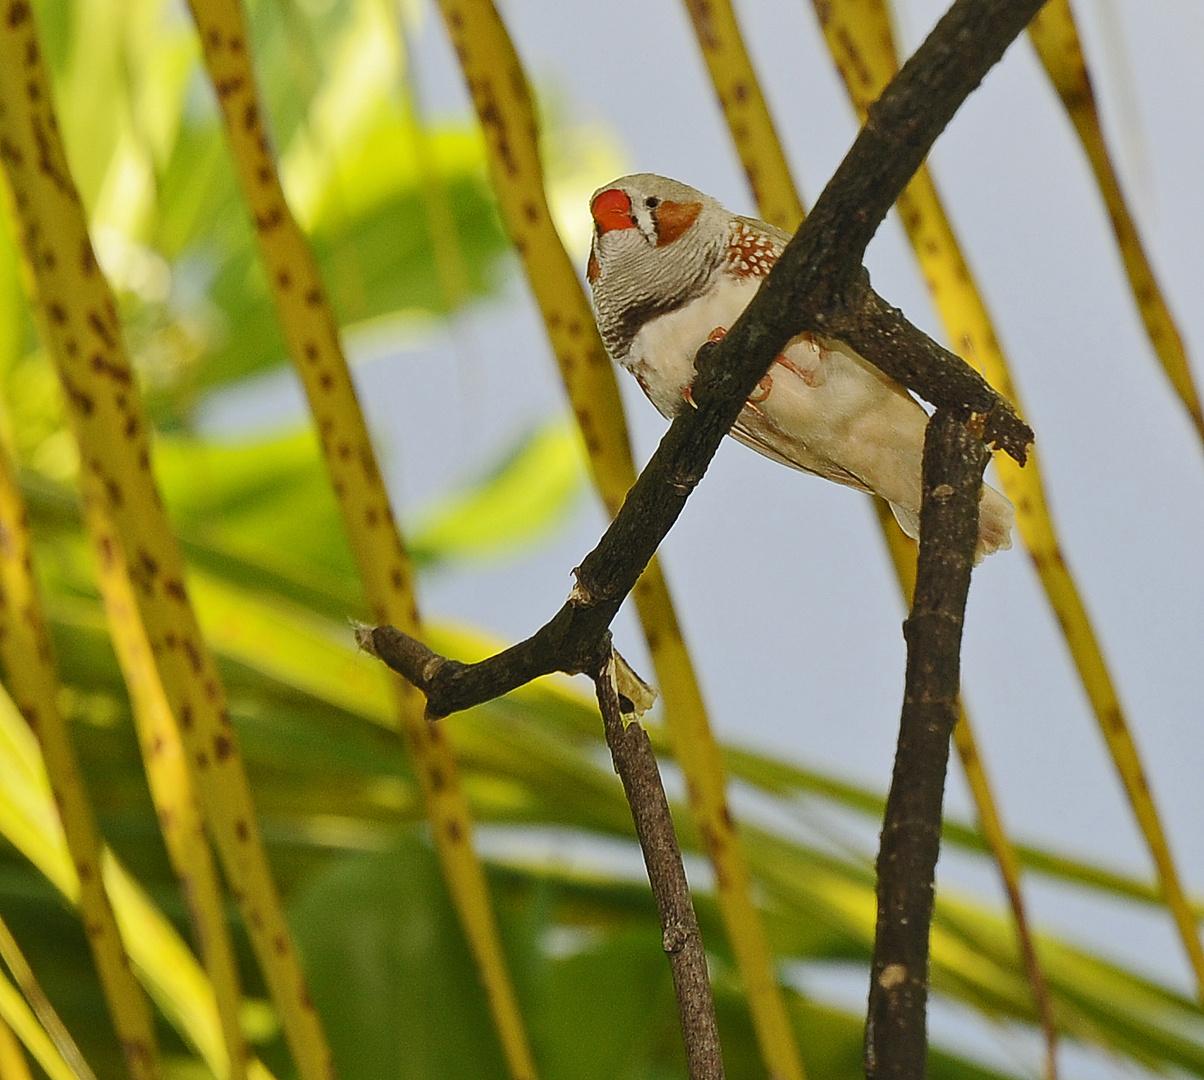 MALEDIVIAN BIRD